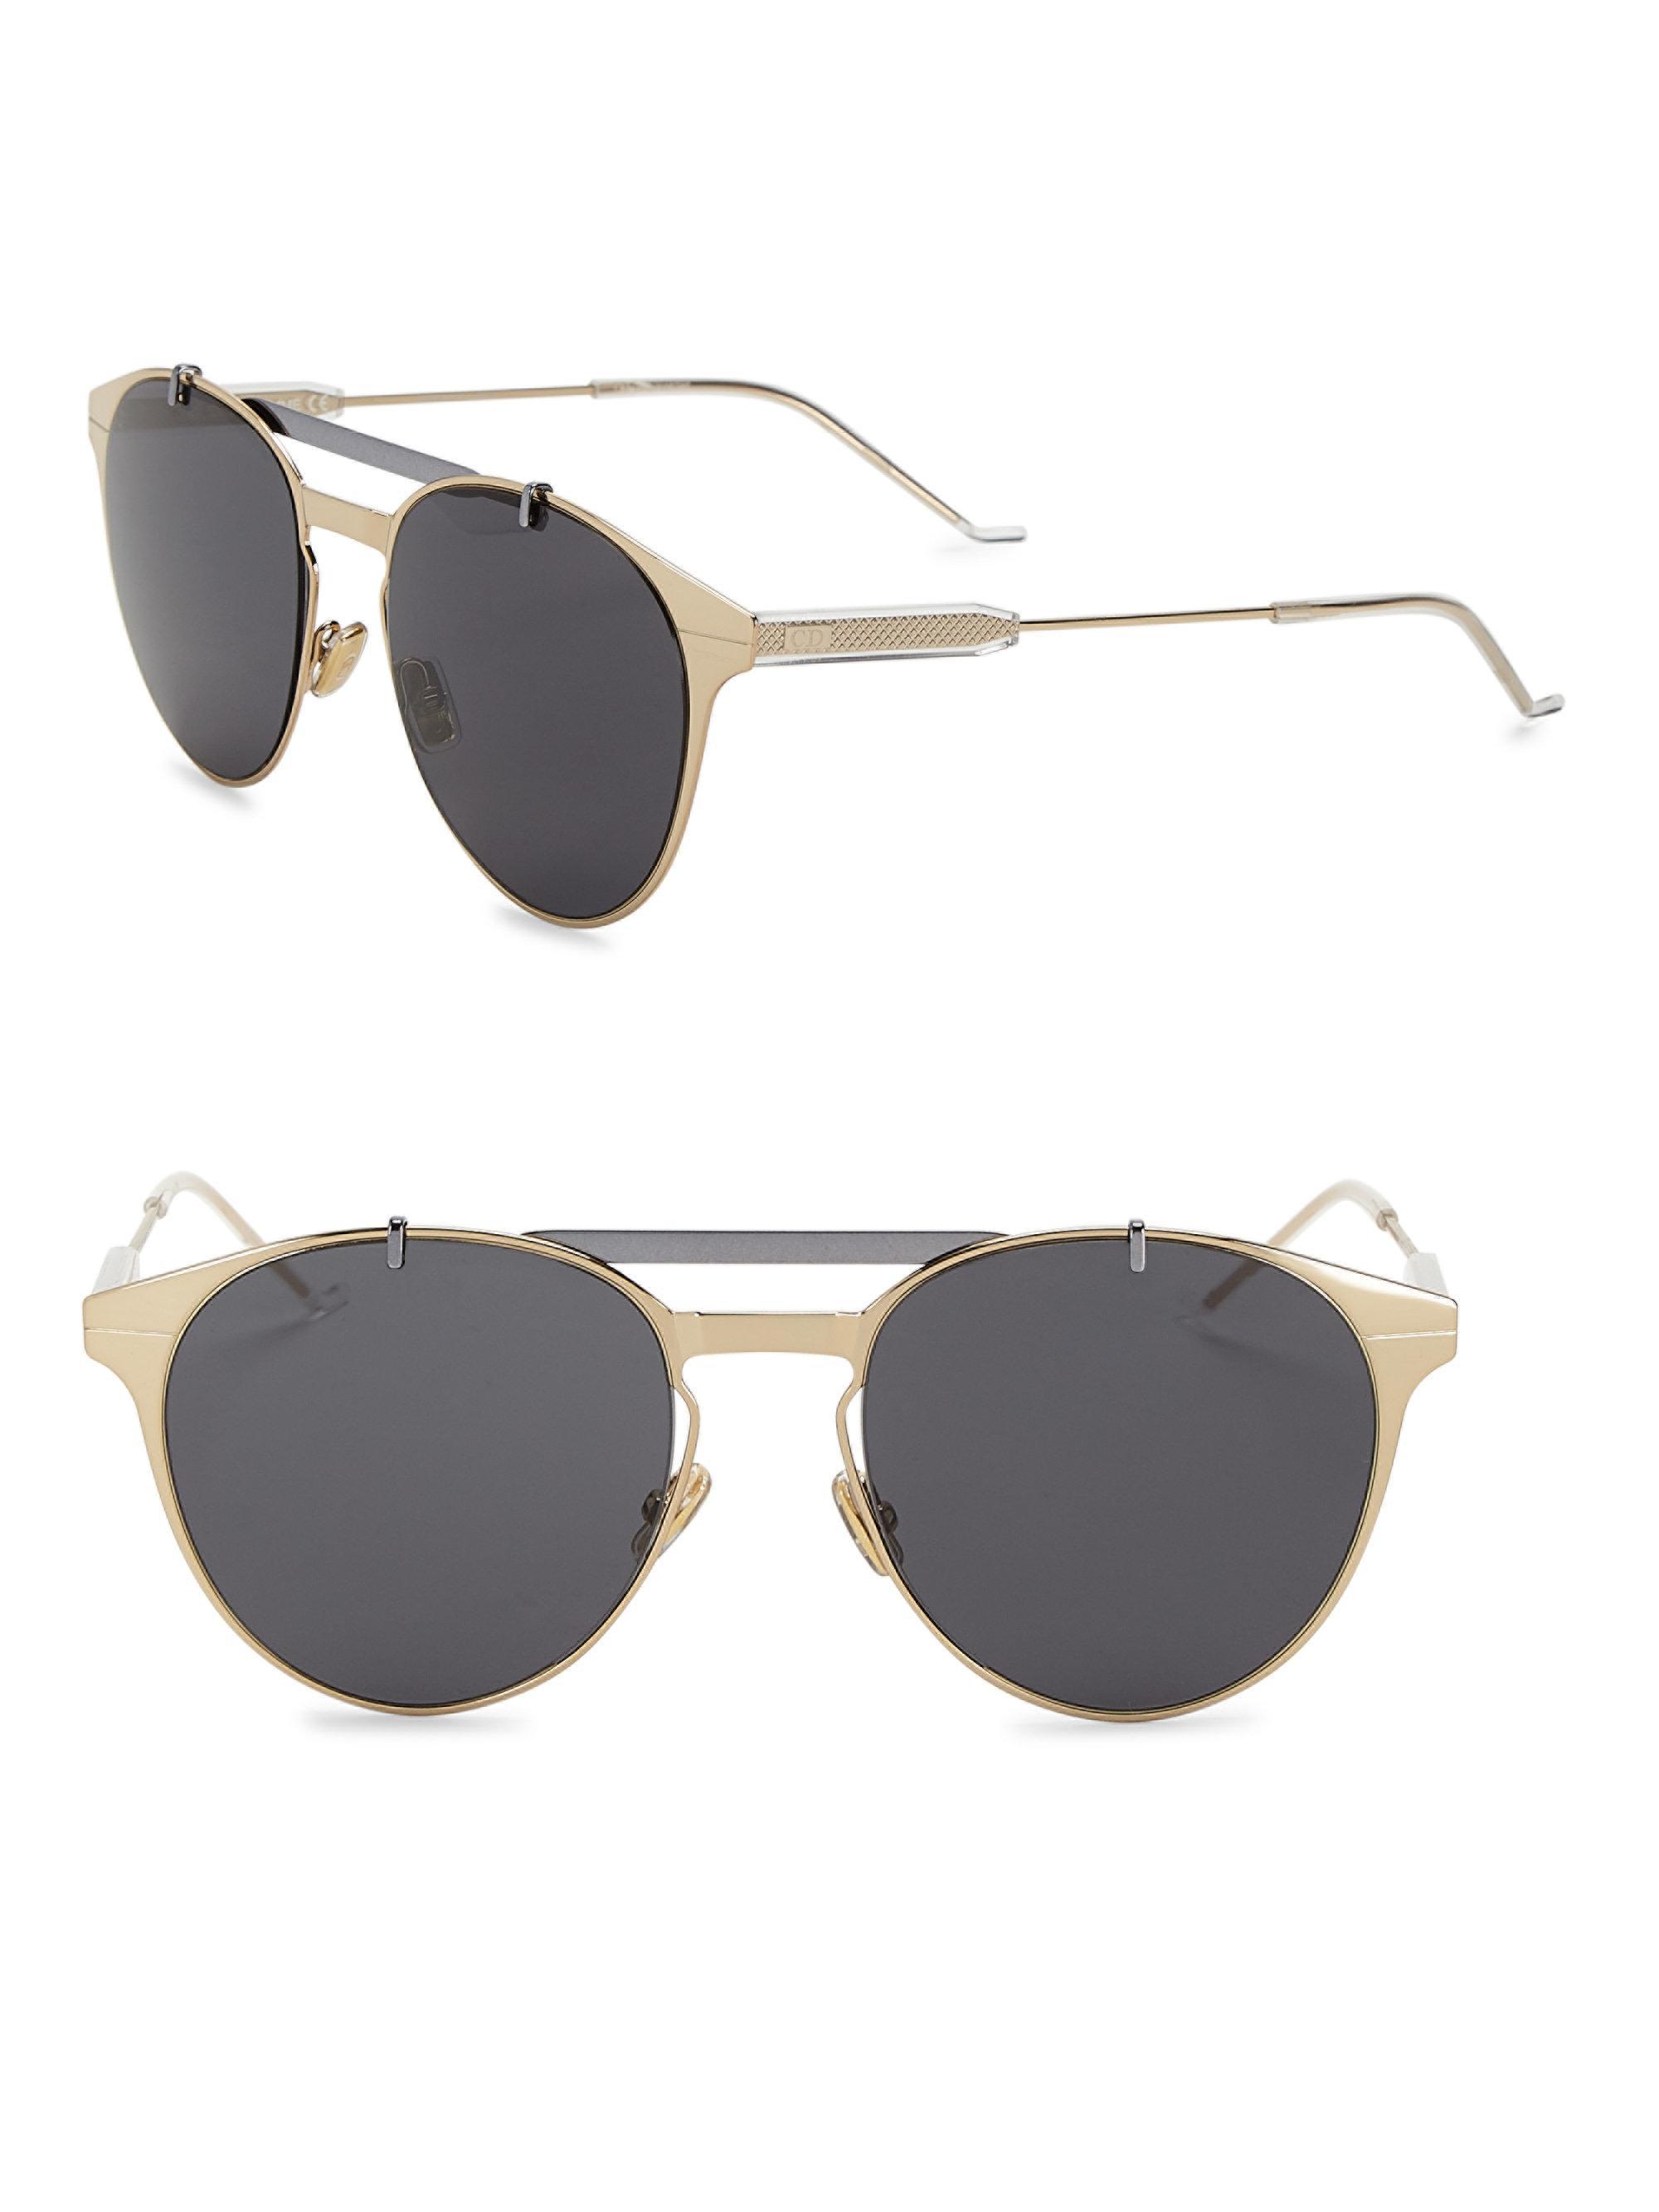 c17de8696a7 Lyst - Dior Homme Dior Motion1 53mm Aviator Sunglasses in Metallic ...